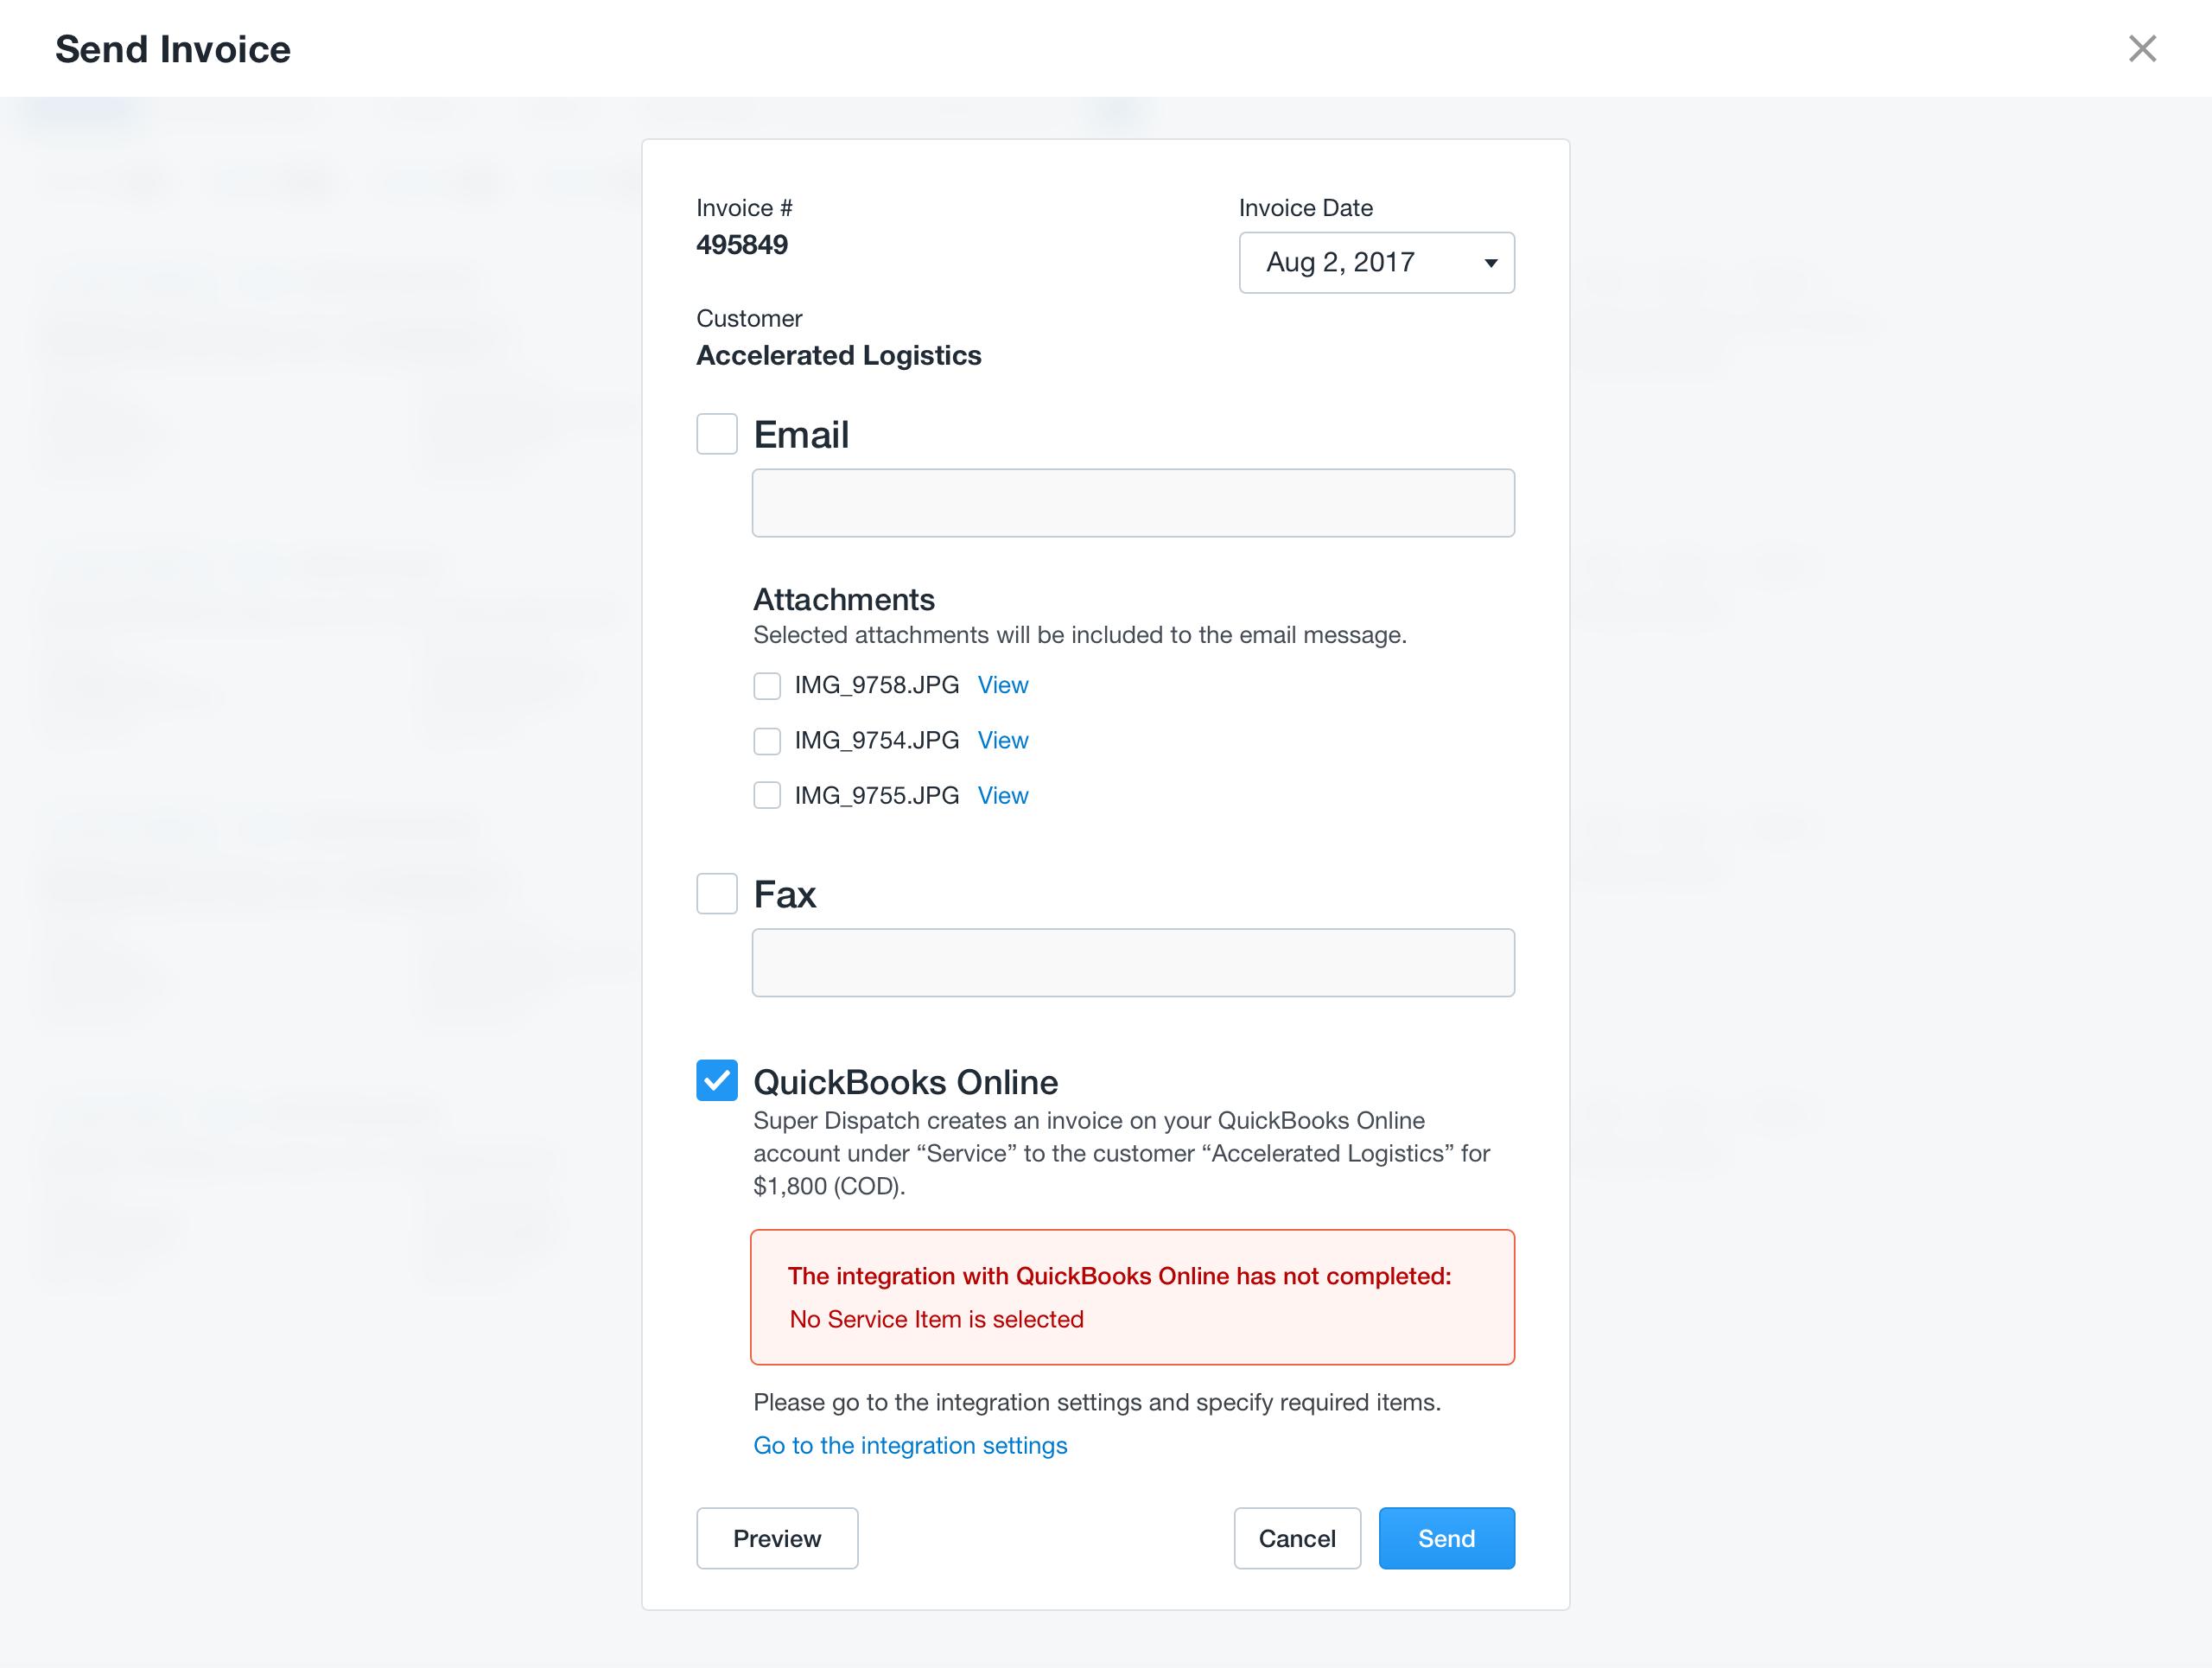 QuickBooks Online Error Messages Send Invoice Super Dispatch - Quickbooks invoice email message